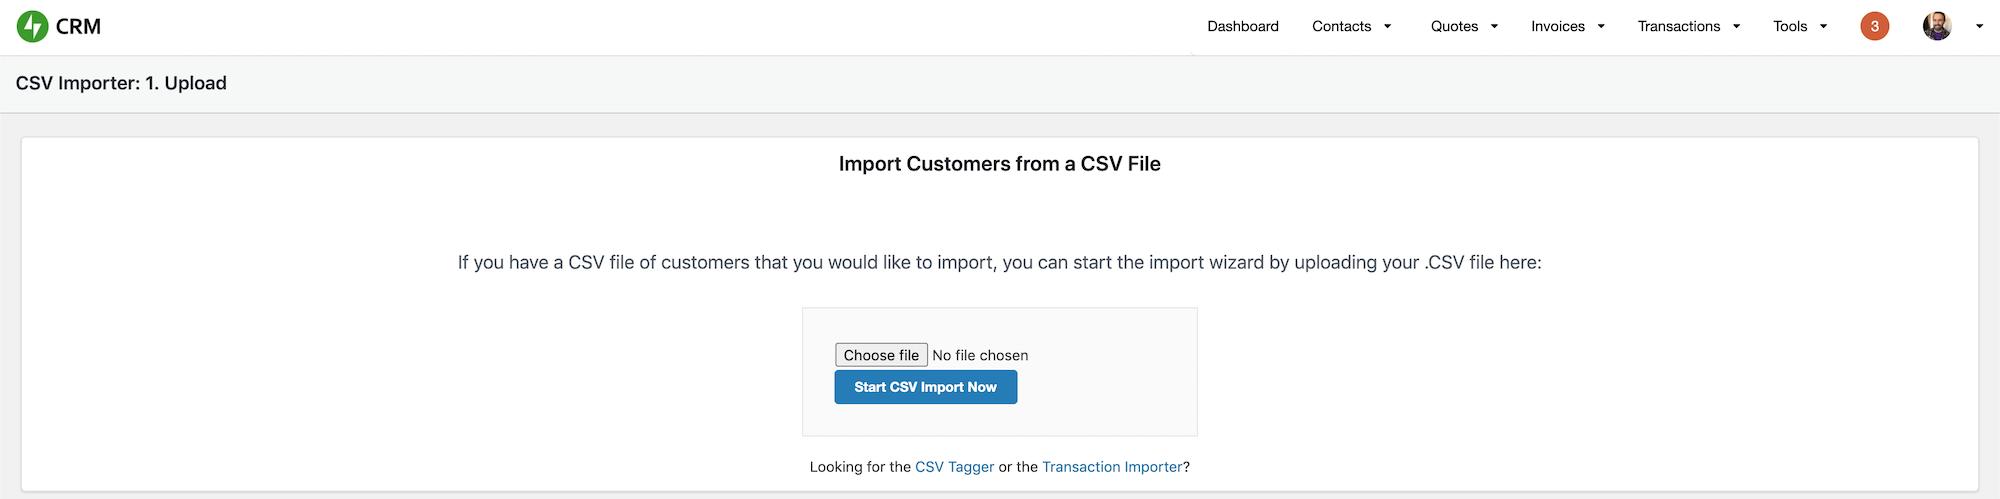 CSV Importer